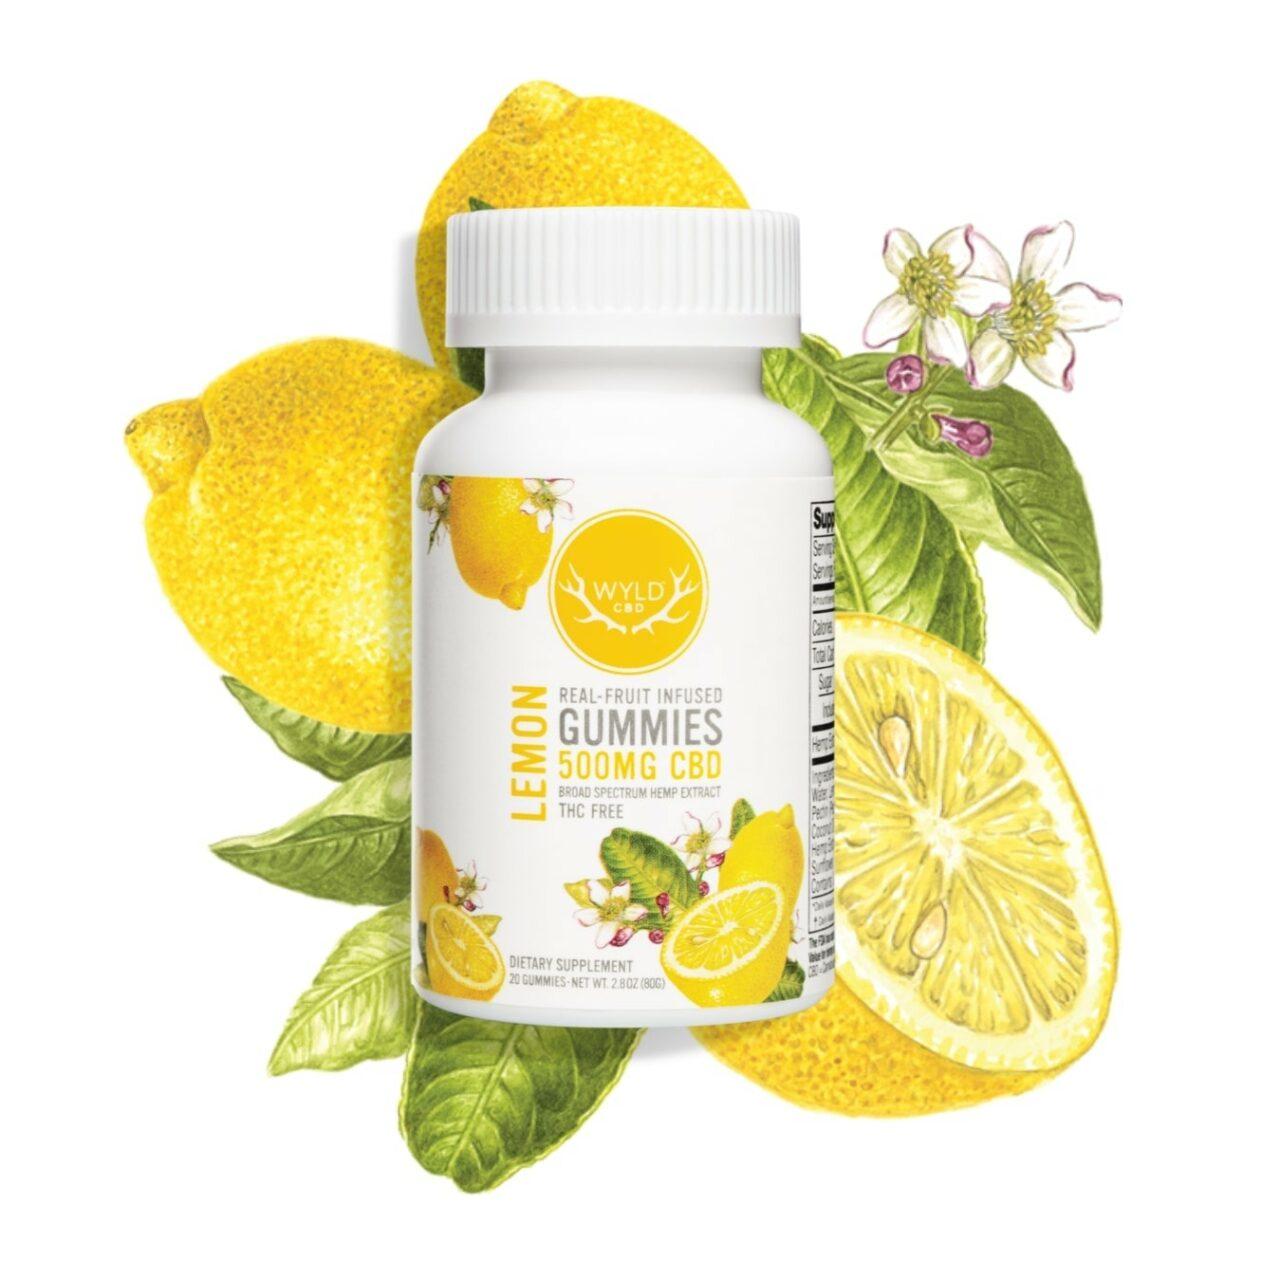 Wyld CBD, Lemon Gummies, Broad Spectrum THC-Free, 20ct, 500mg CBD